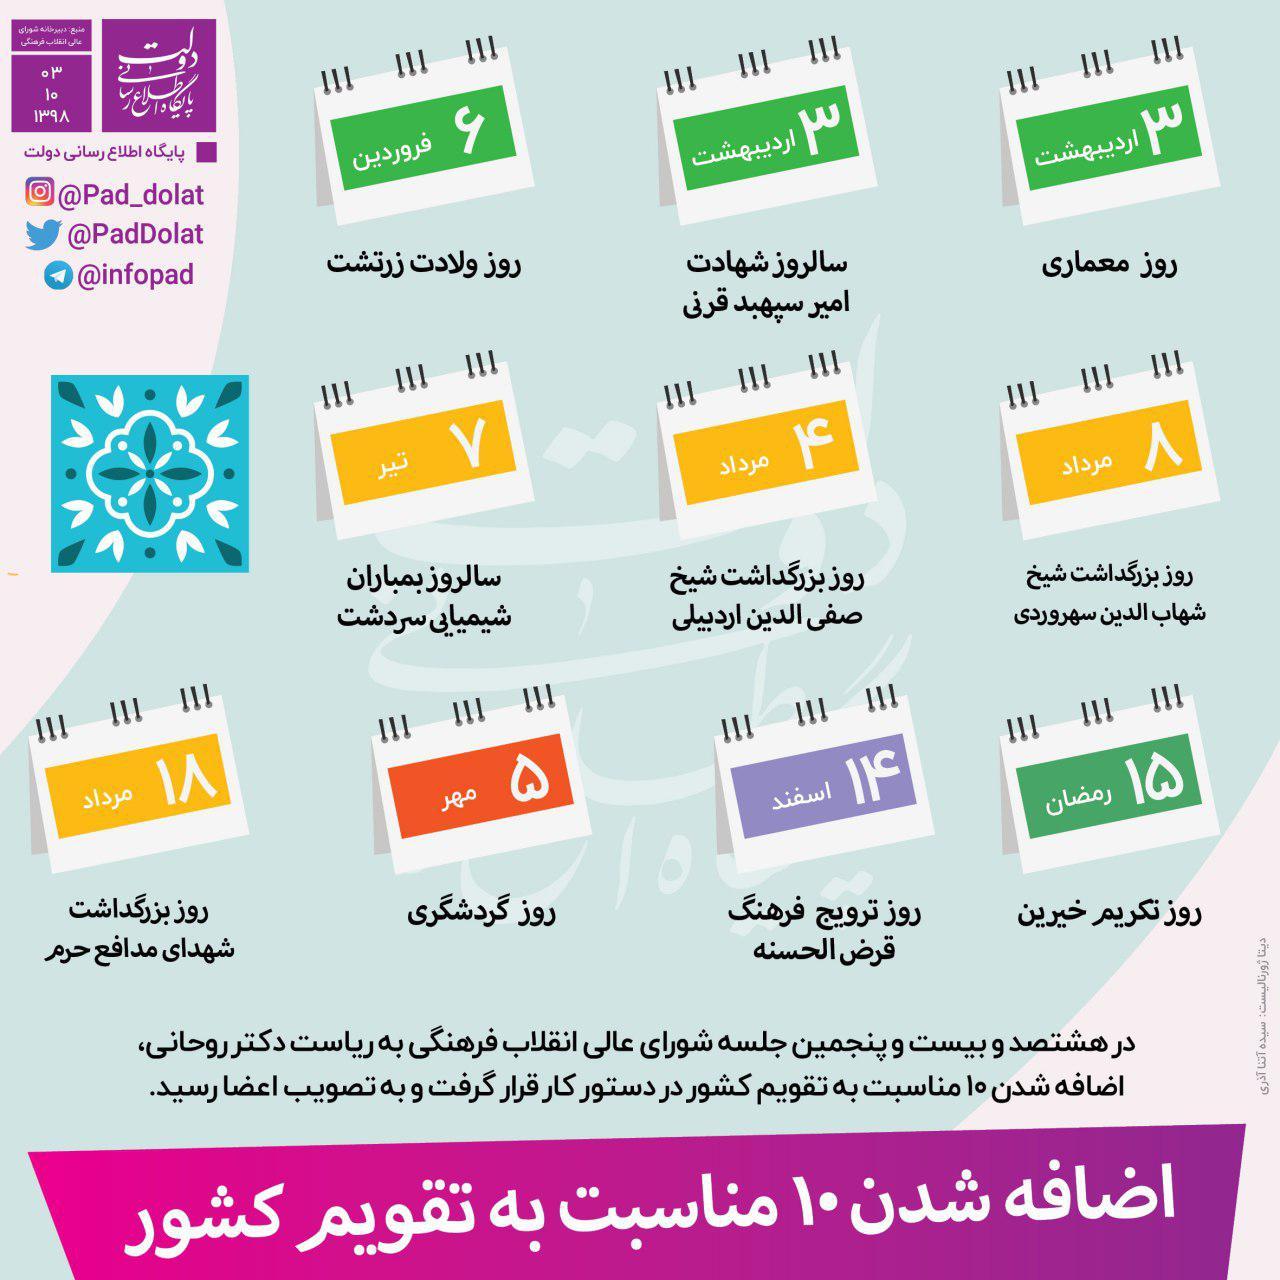 اضافه شدن ۱۰ مناسبت به تقویم کشور